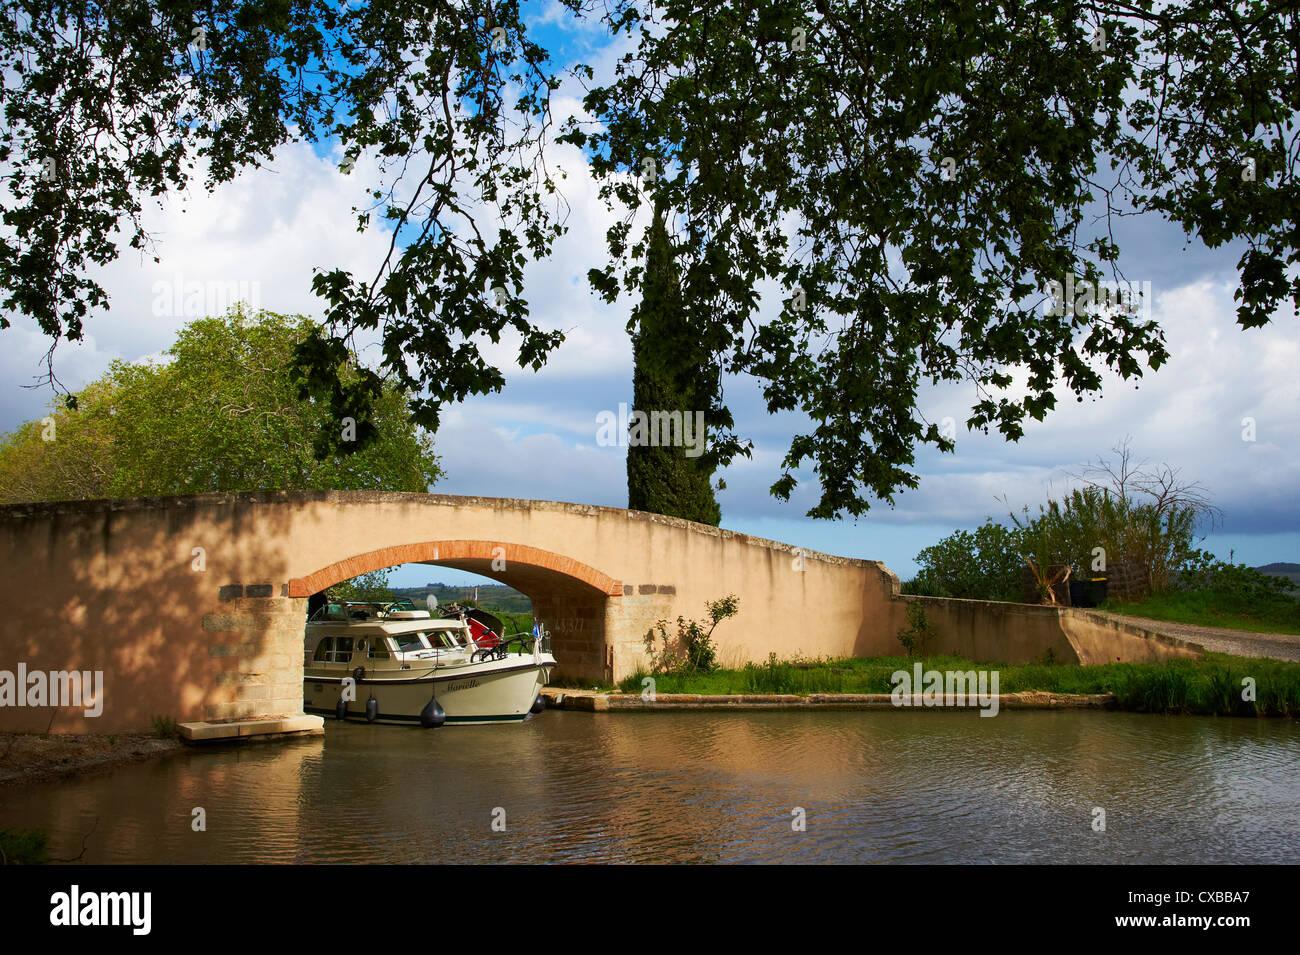 Bridge over the Canal du Midi, UNESCO World Heritage Site, Aude, Languedoc Roussillon, France, Europe - Stock Image